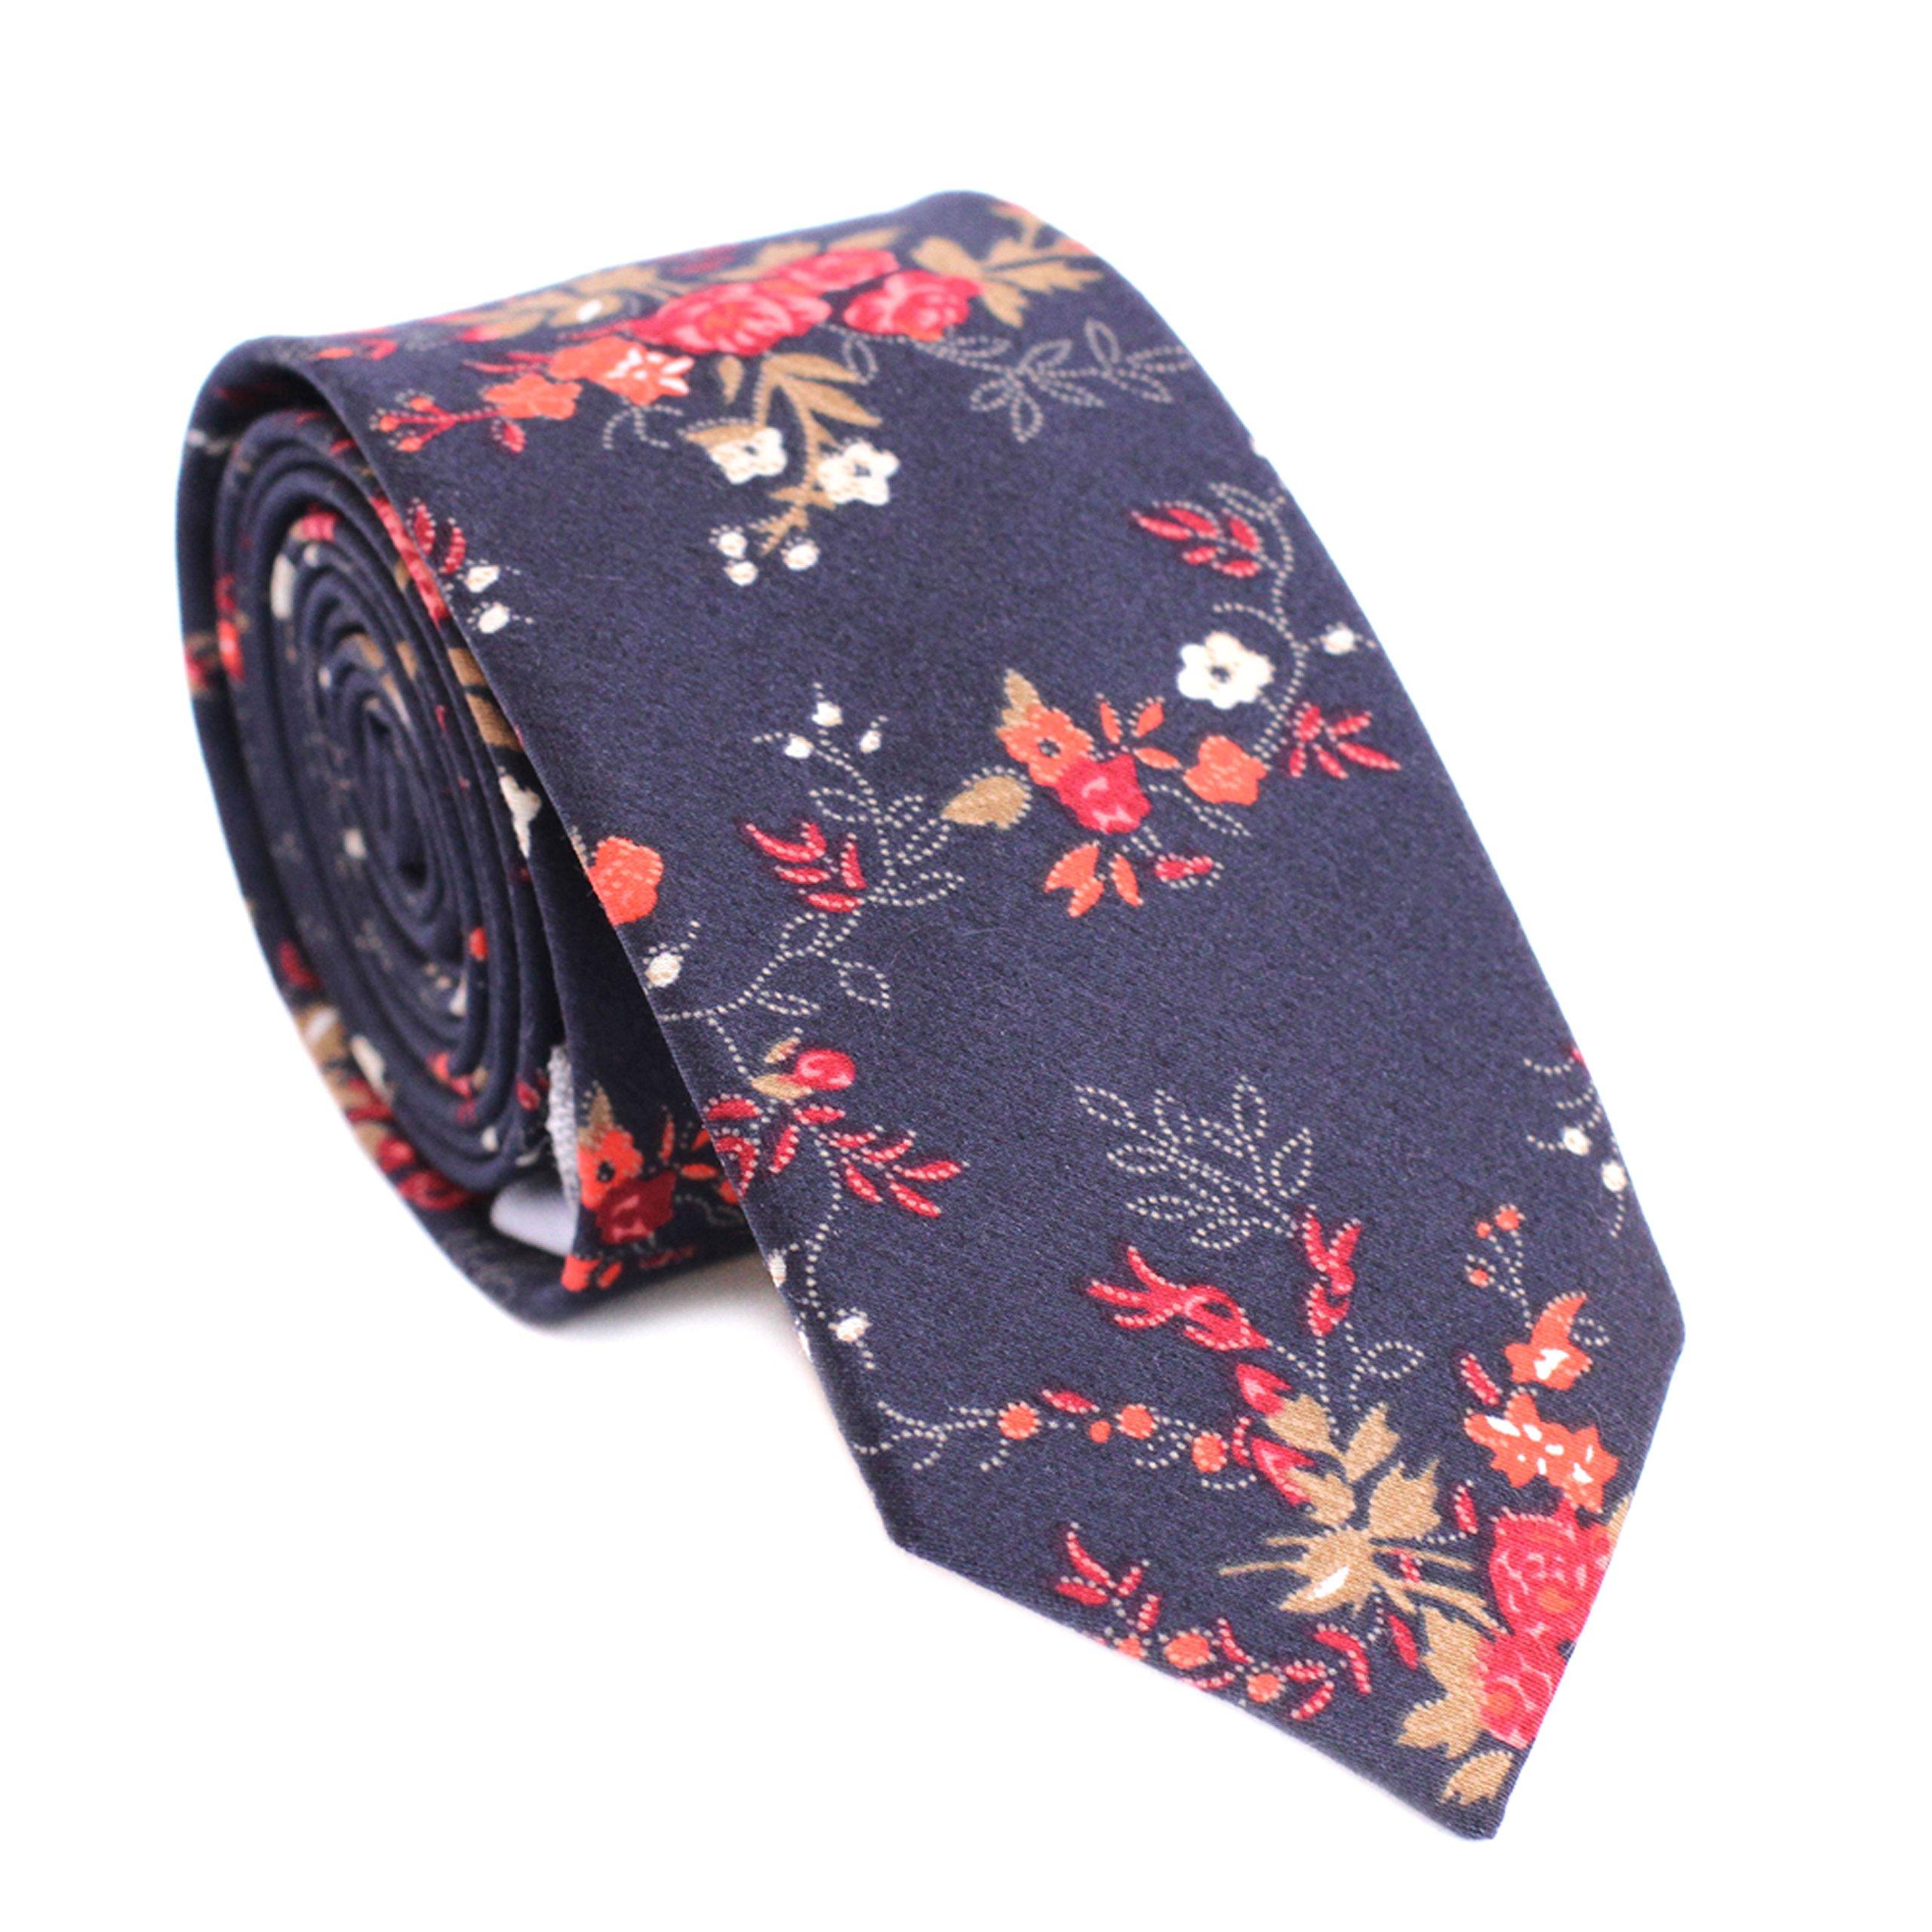 DAZI Men's Skinny Tie Floral Print Cotton Necktie, Great for Weddings, Groom, Groomsmen, Missions, Dances, Gifts. (Coral Flor)